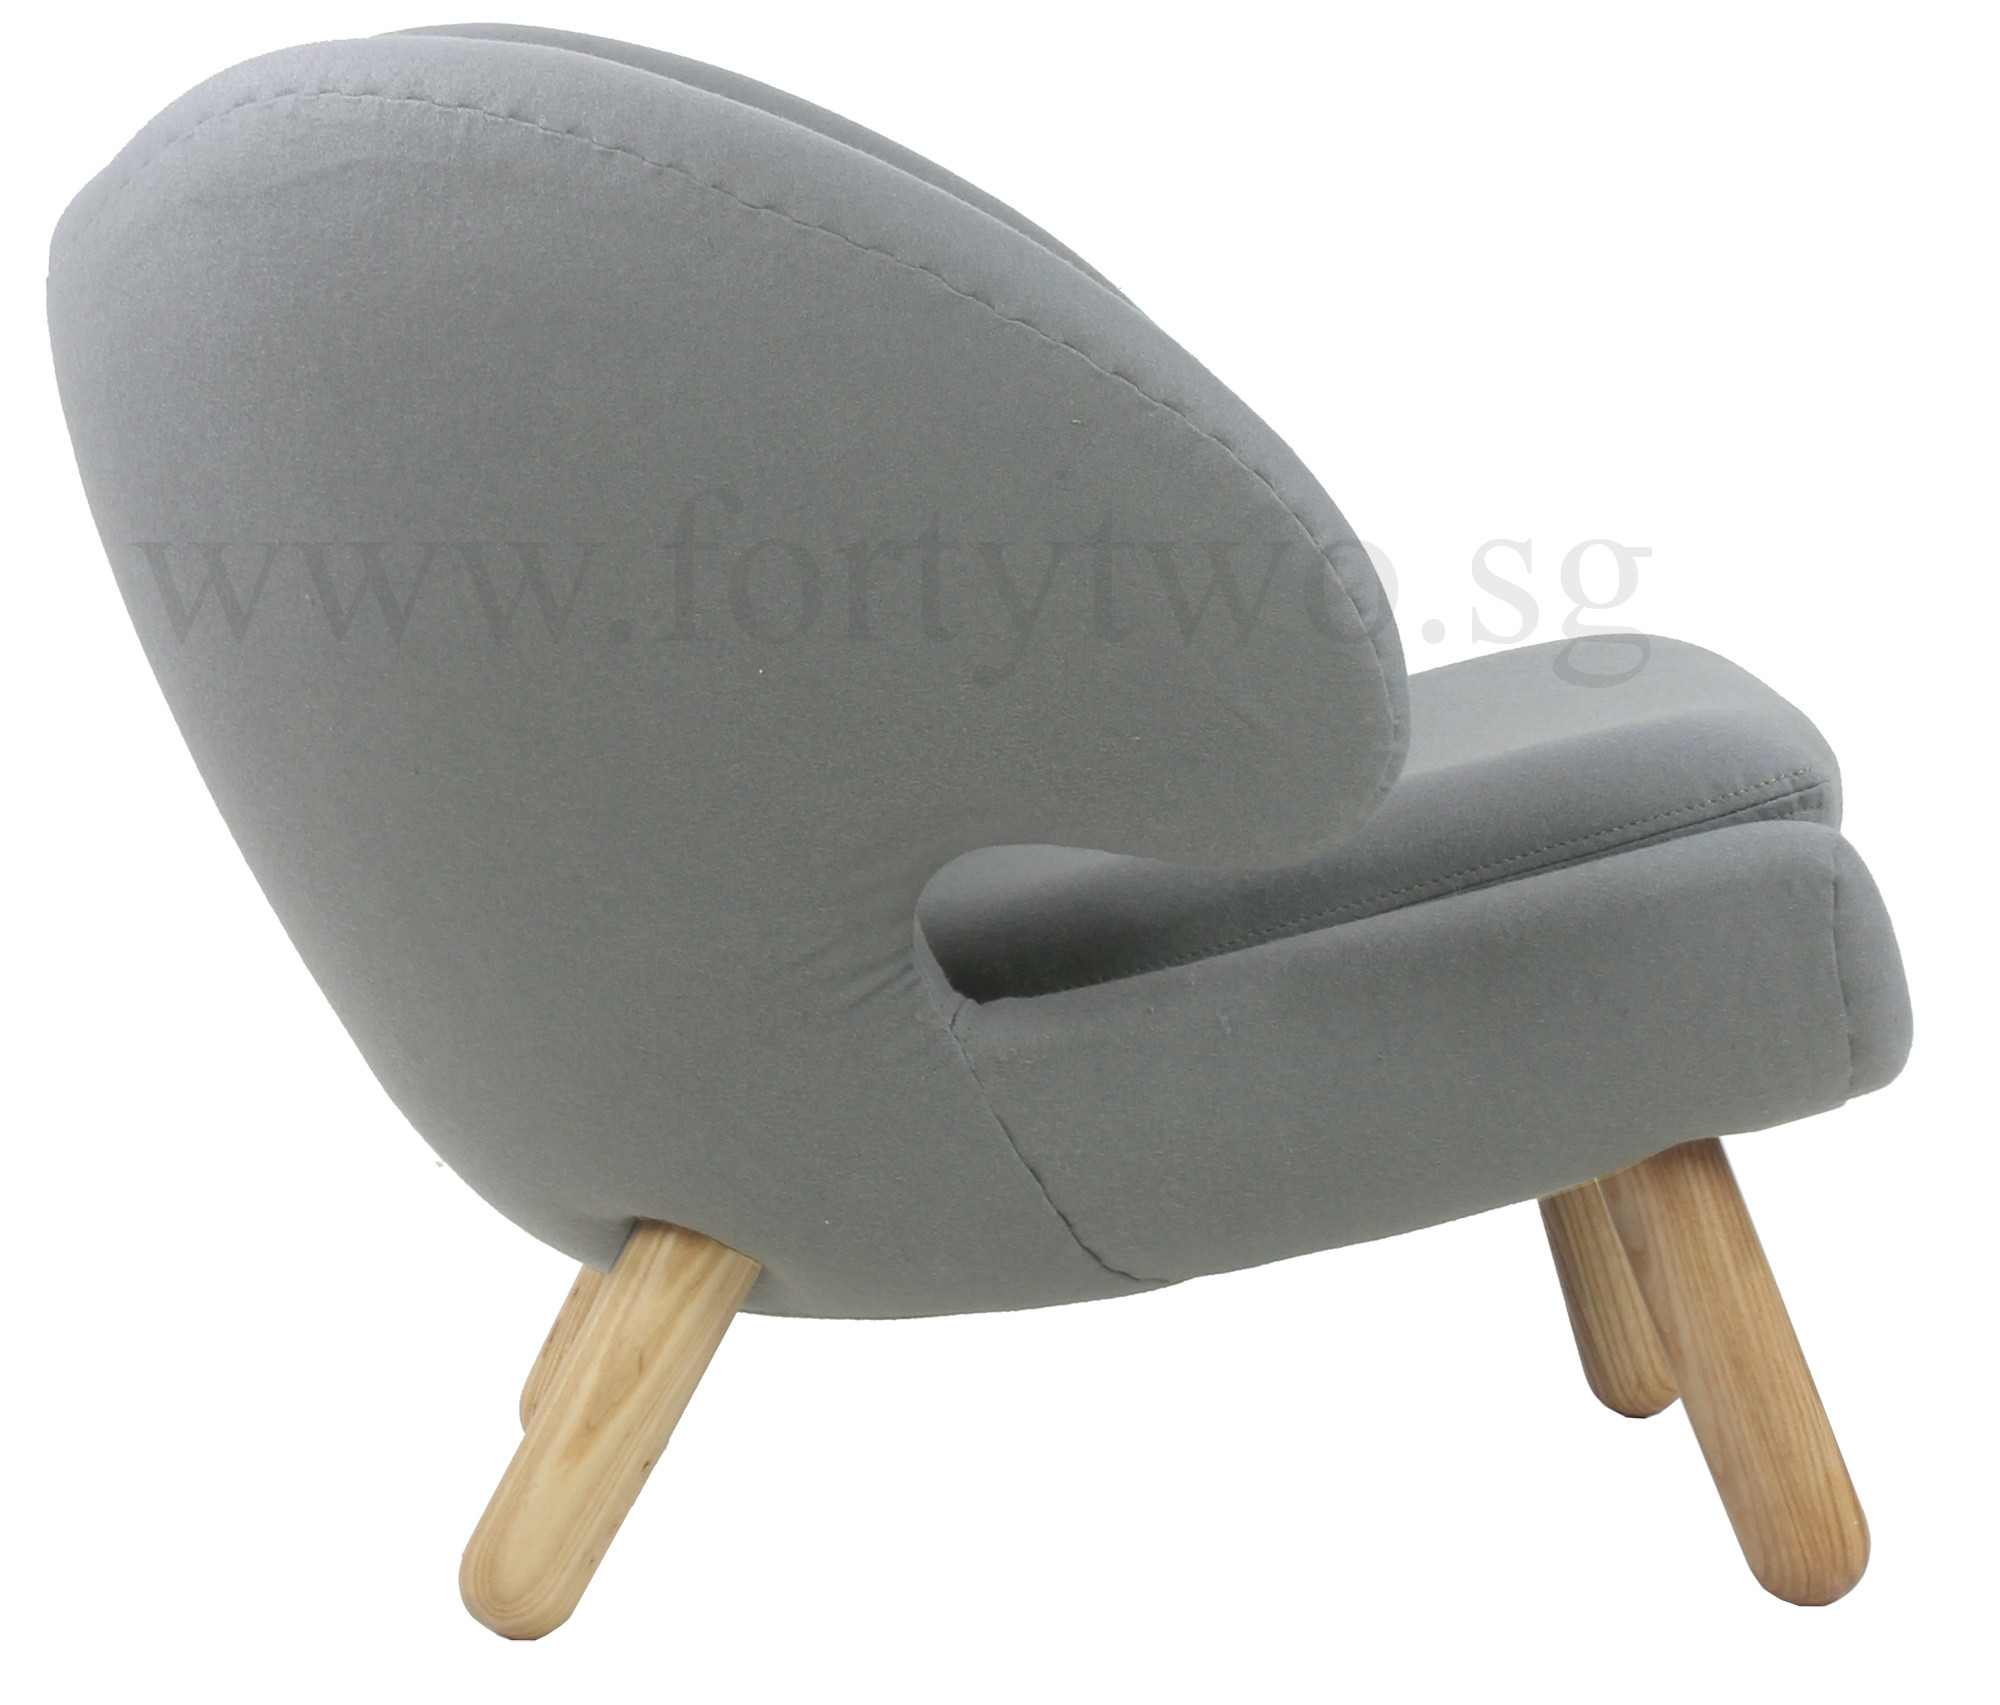 Designer replica pelican chair in light grey trending for Replica designer furniture usa